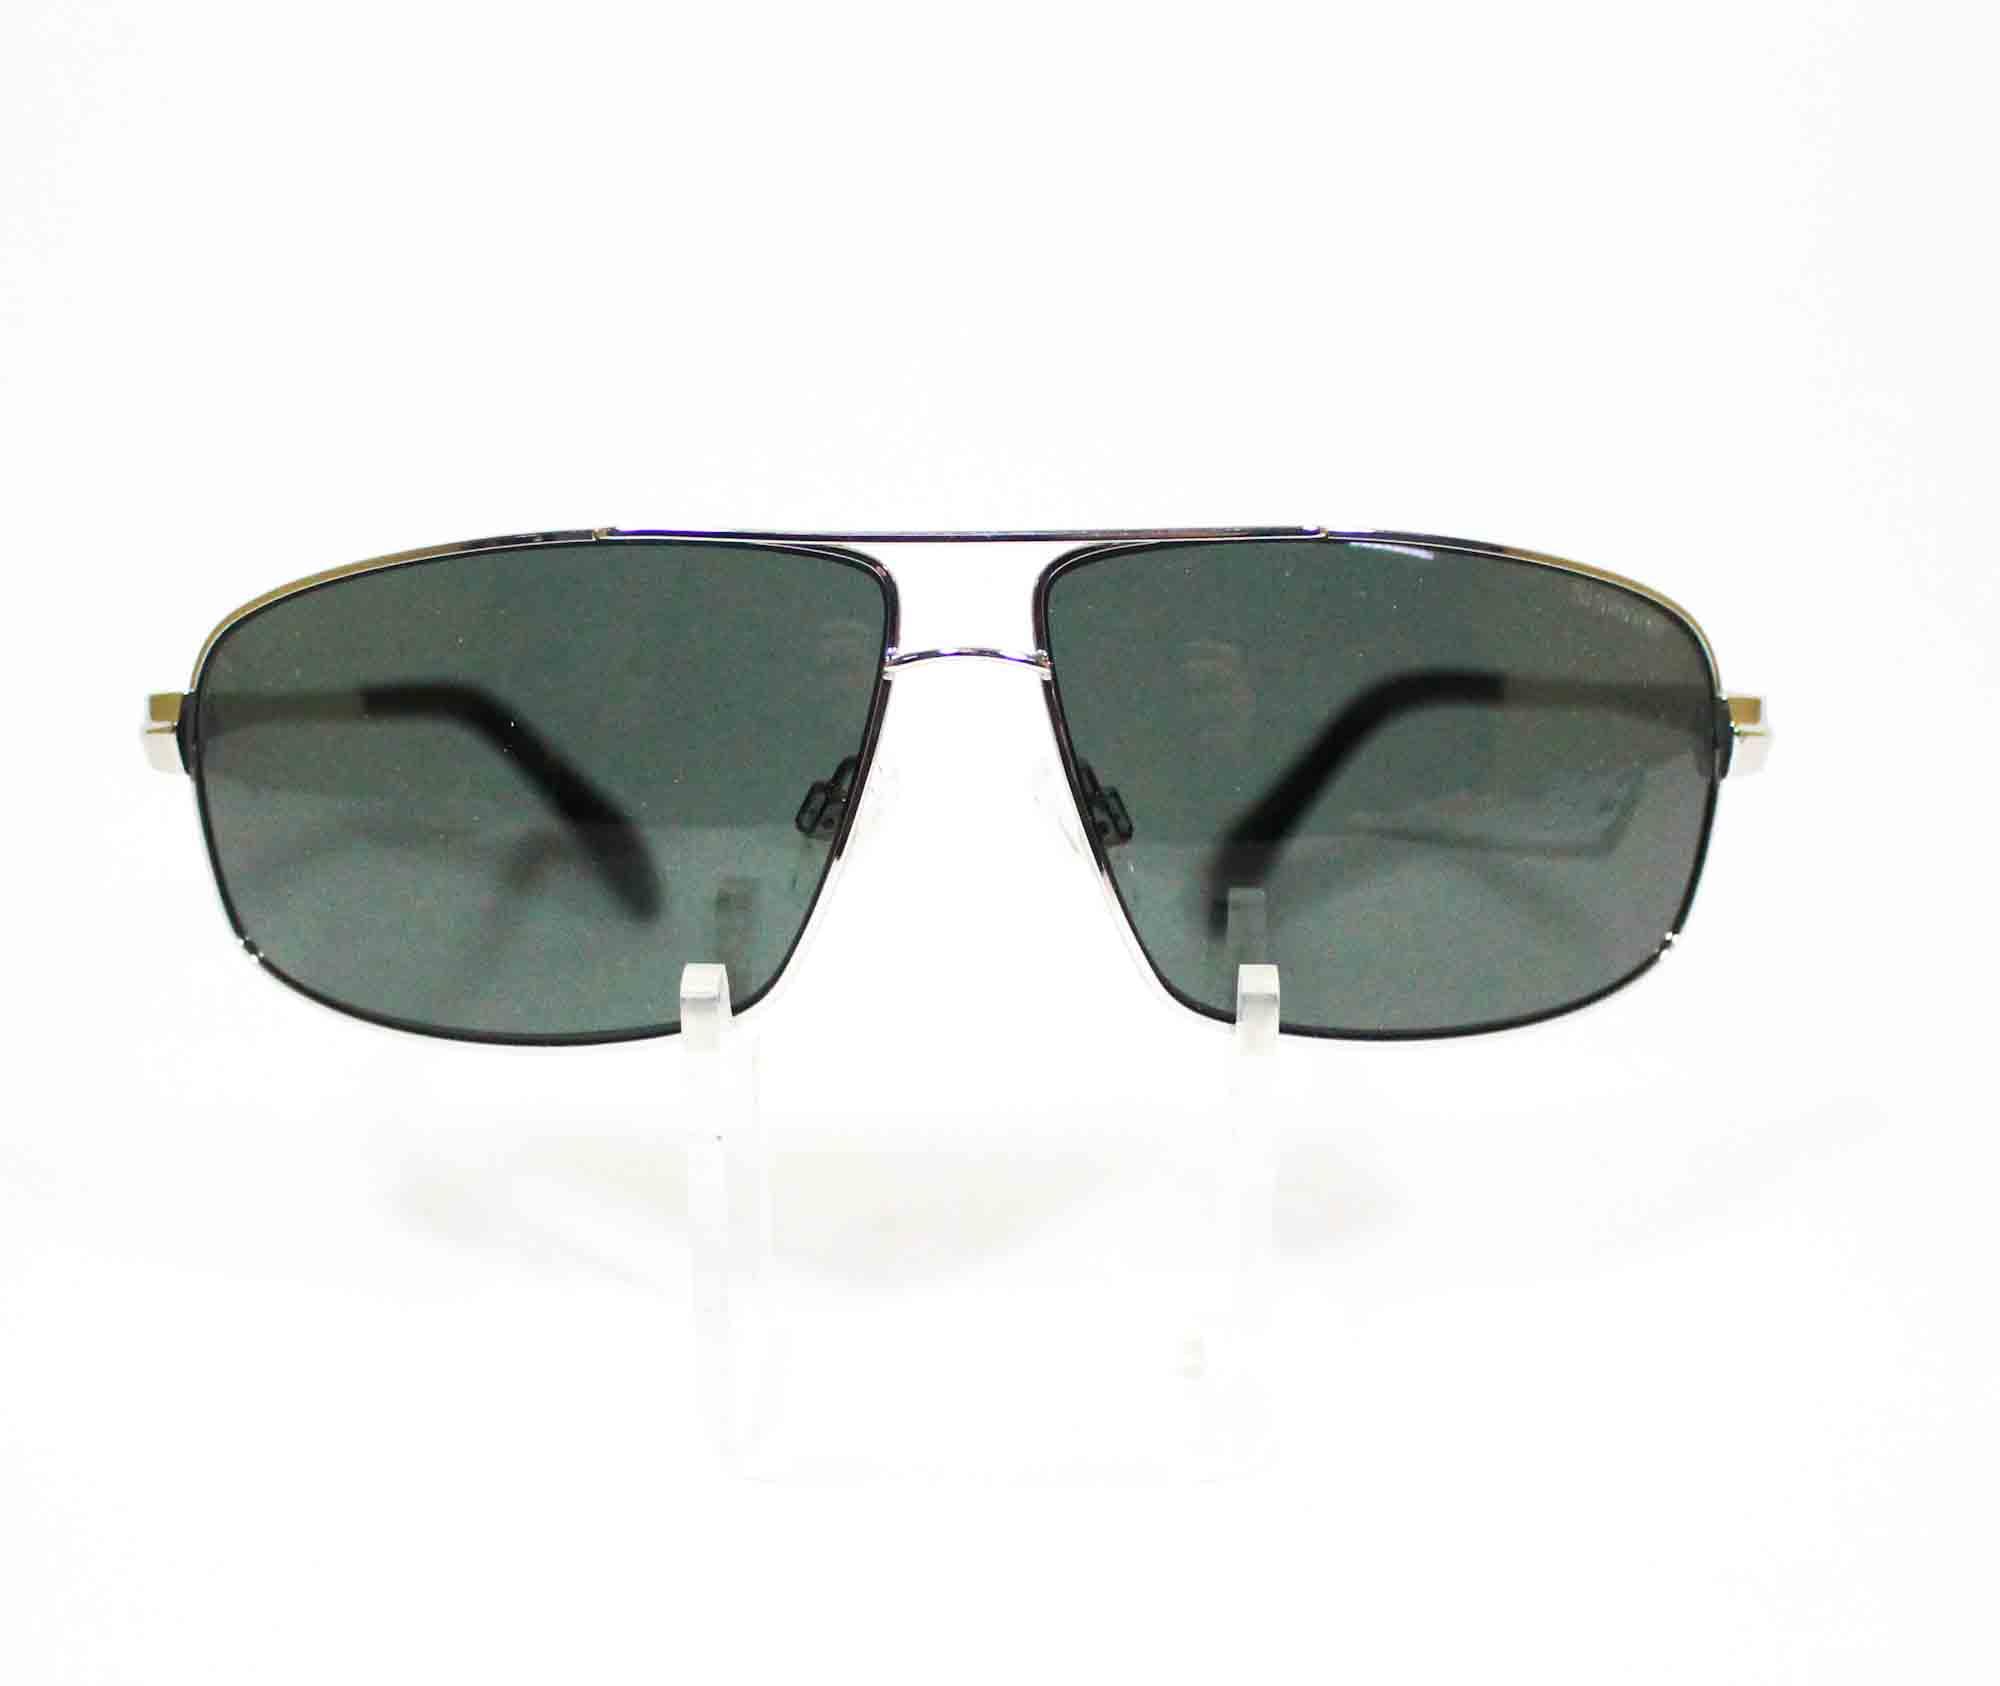 Shimano HG-081N Sunglasses Polarised Metal Frame TD (3314)